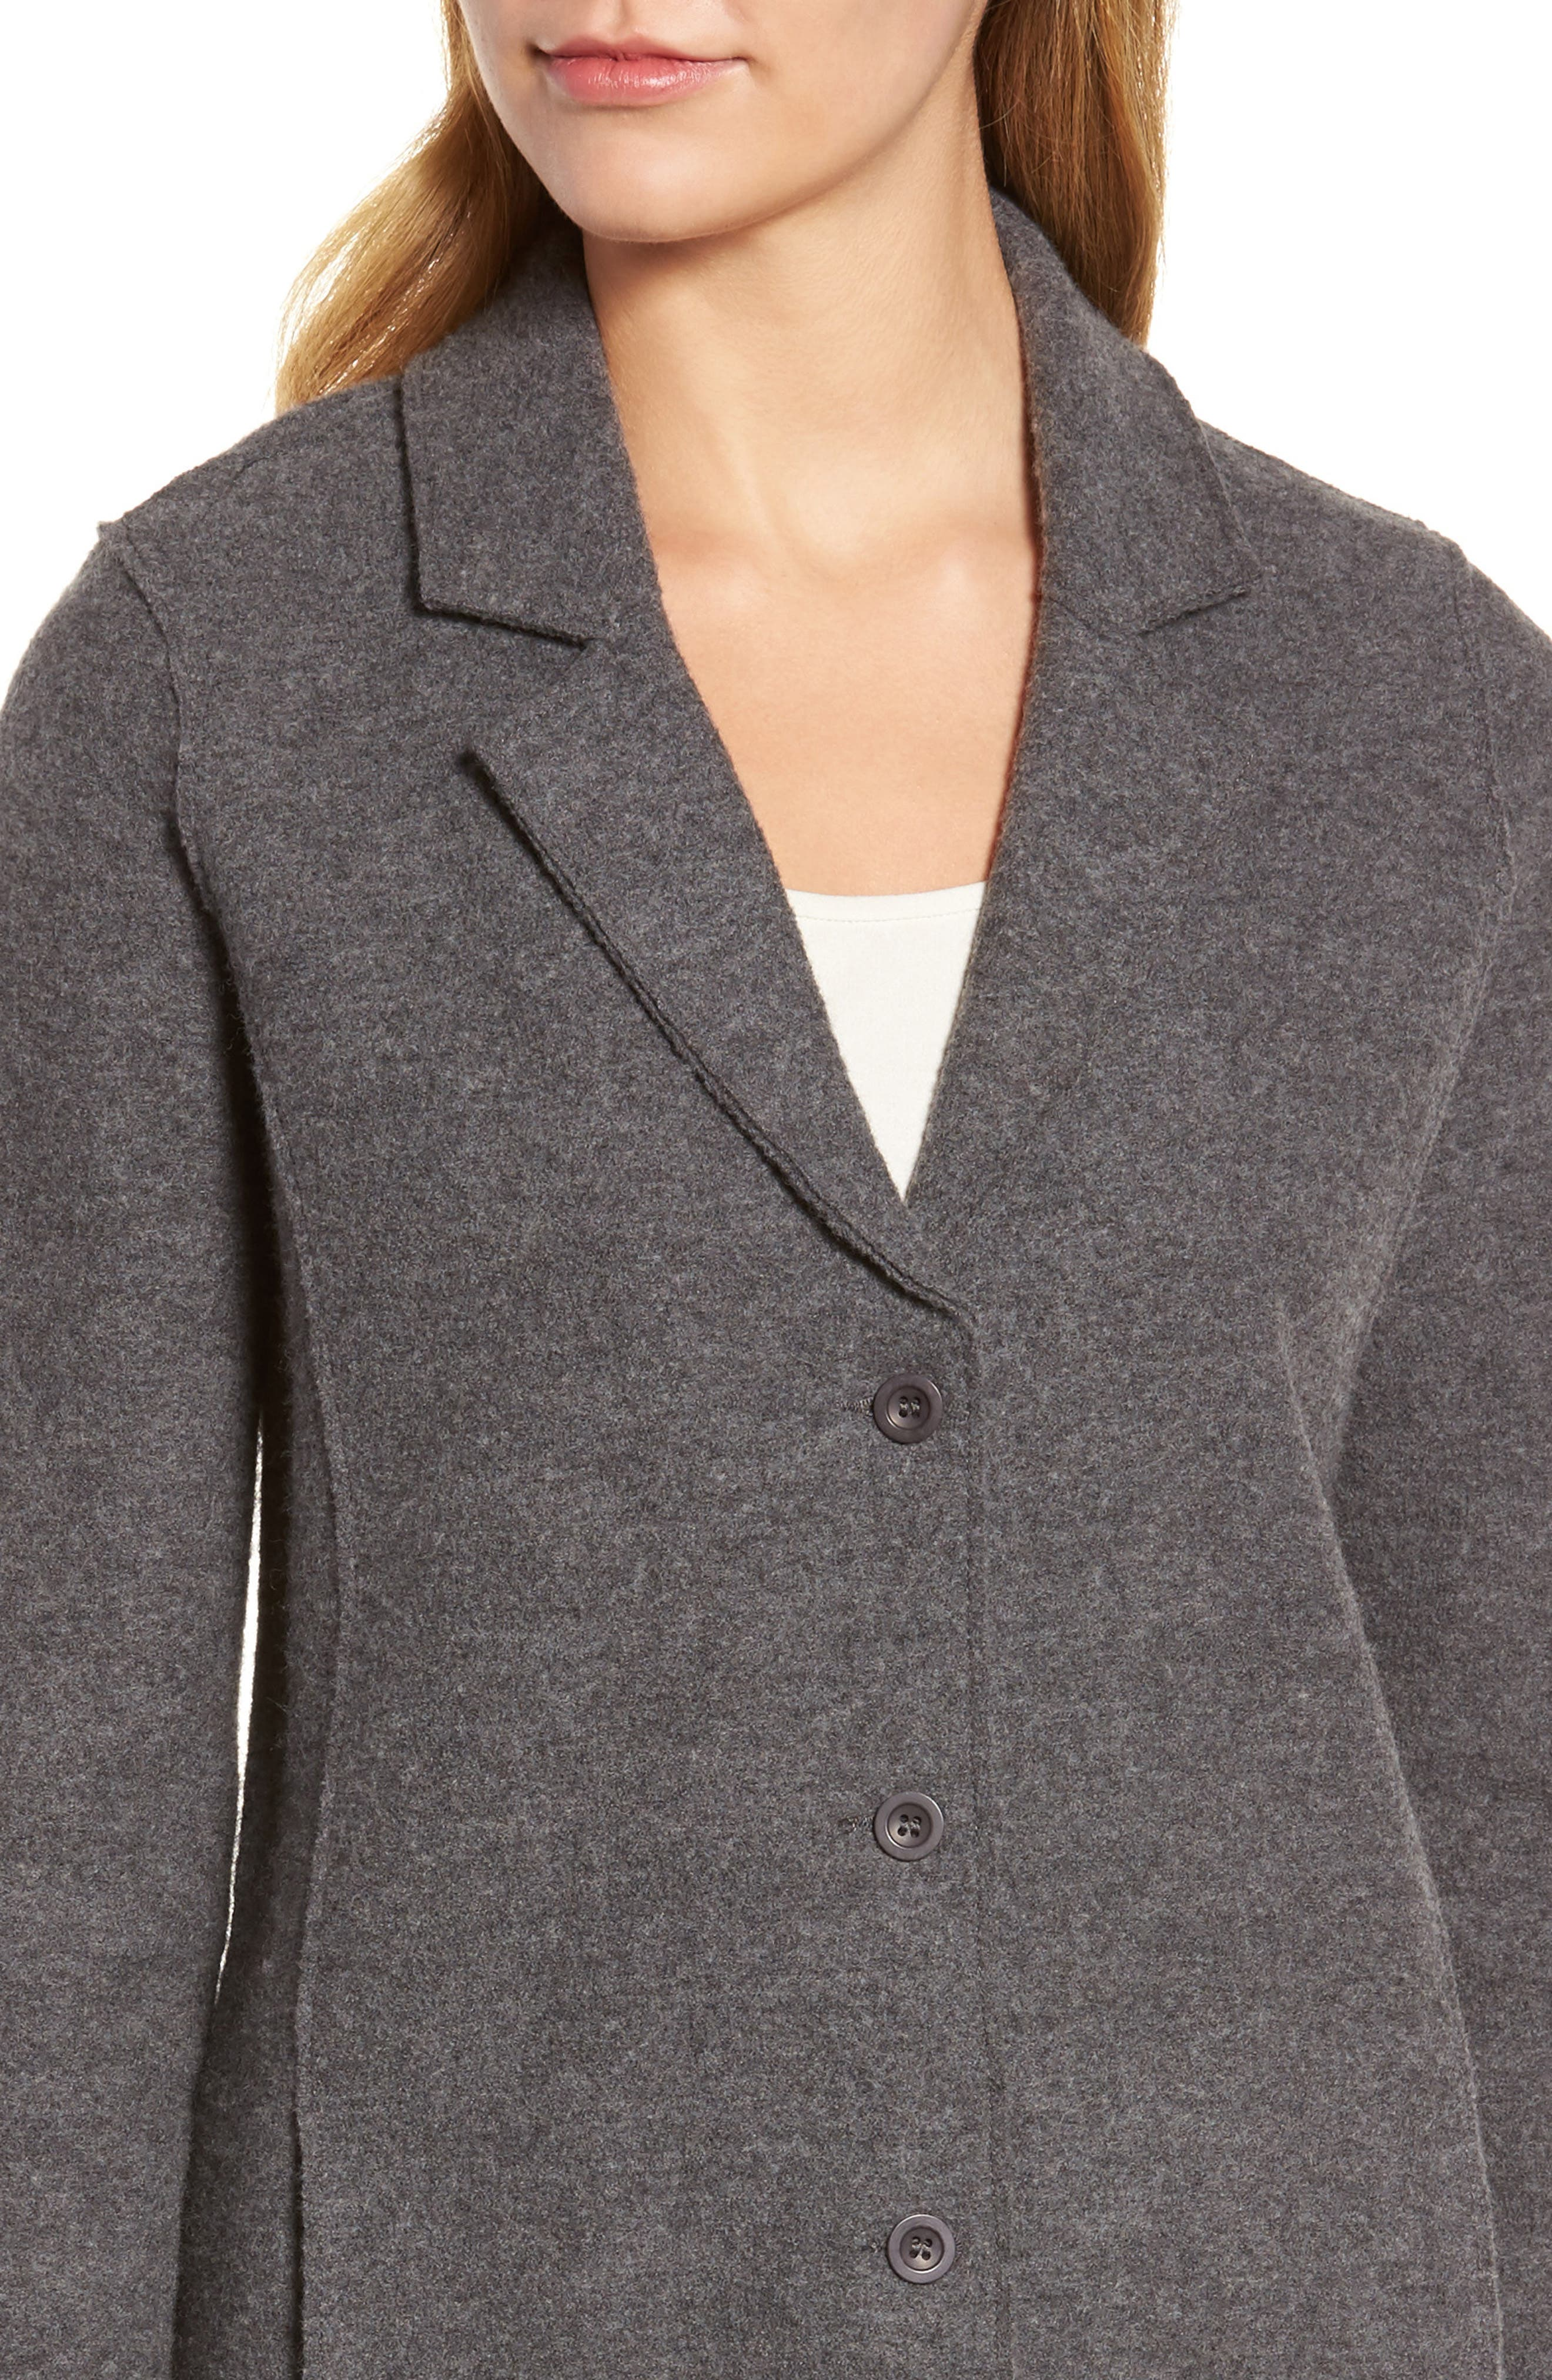 Notch Collar Merino Wool Jacket,                             Alternate thumbnail 4, color,                             Ash